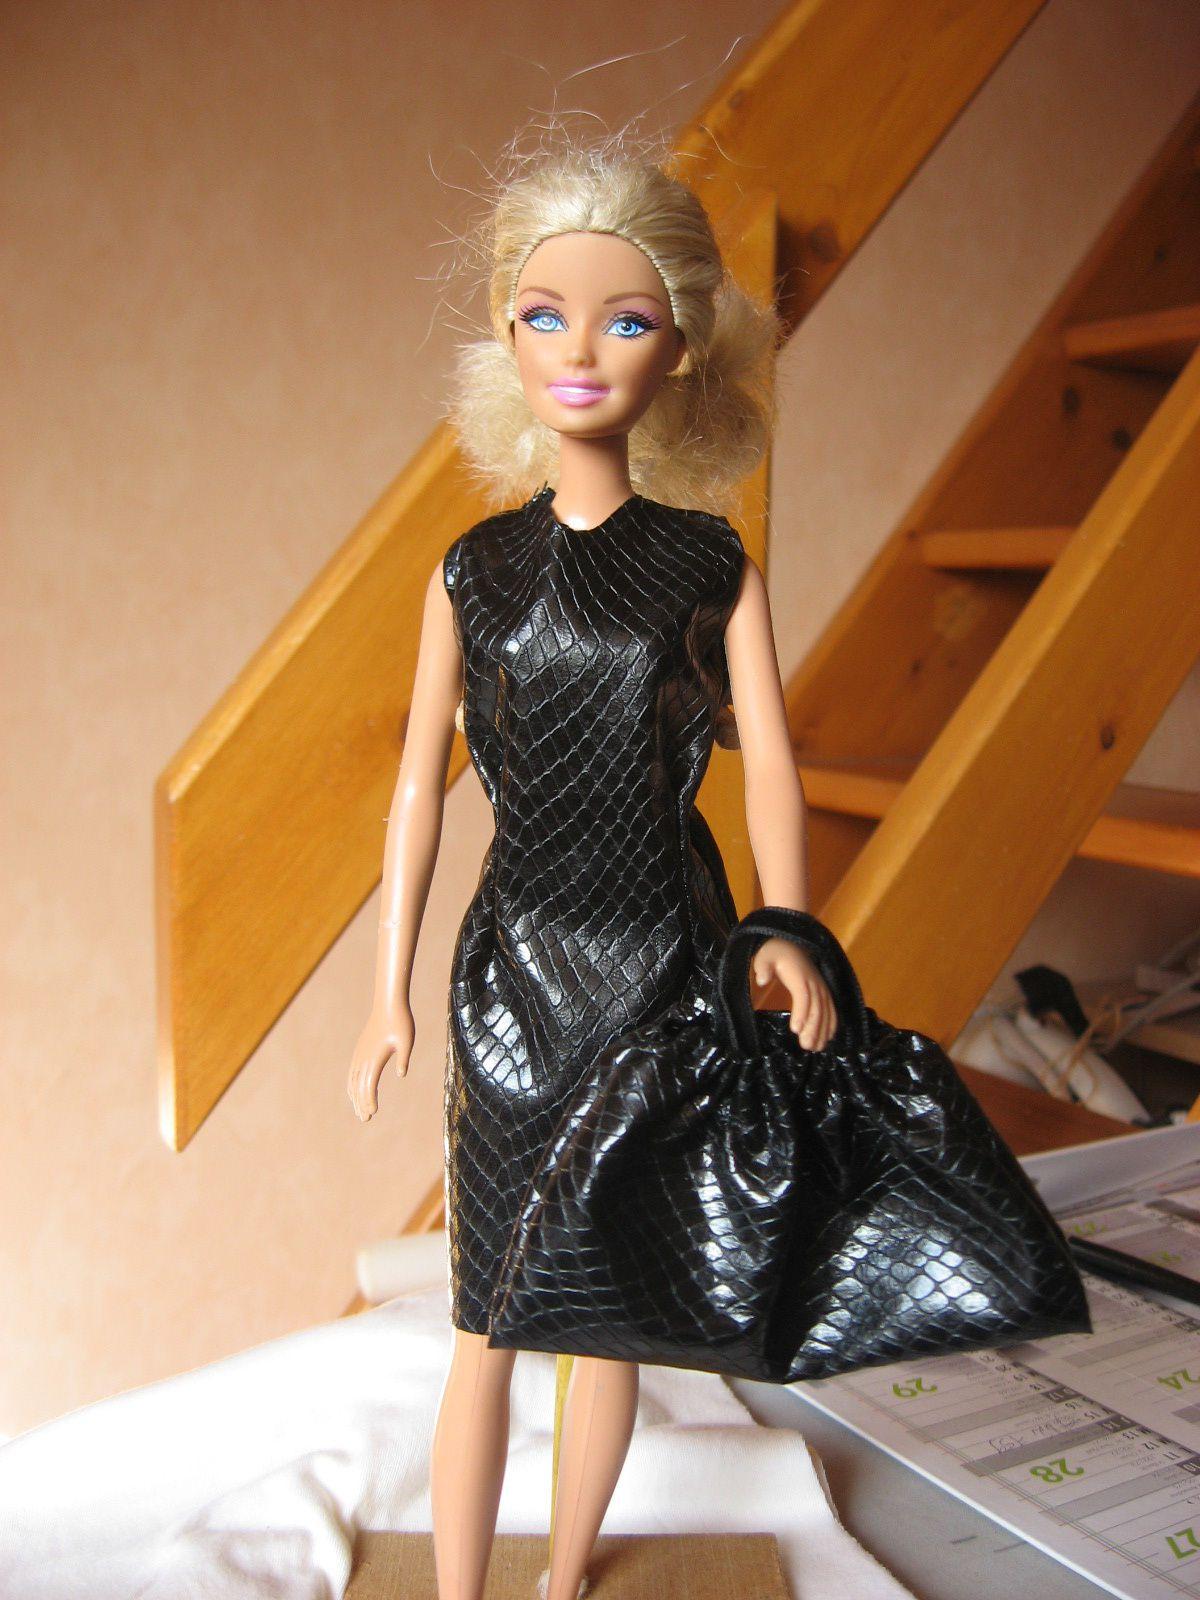 vetements barbie les tutos de pamina. Black Bedroom Furniture Sets. Home Design Ideas